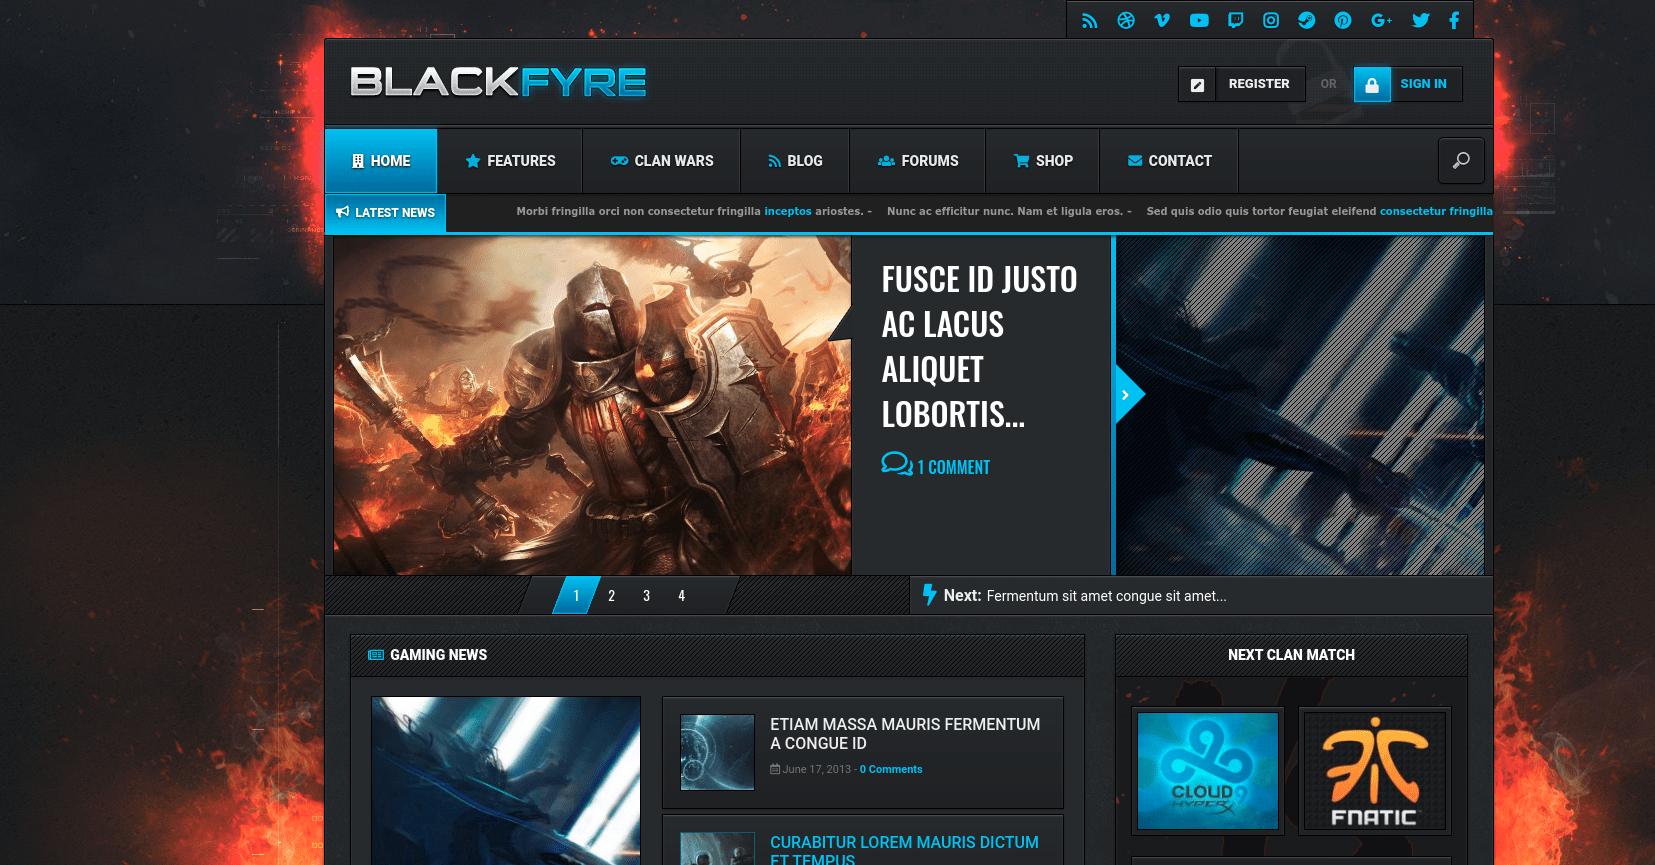 blackfyre website